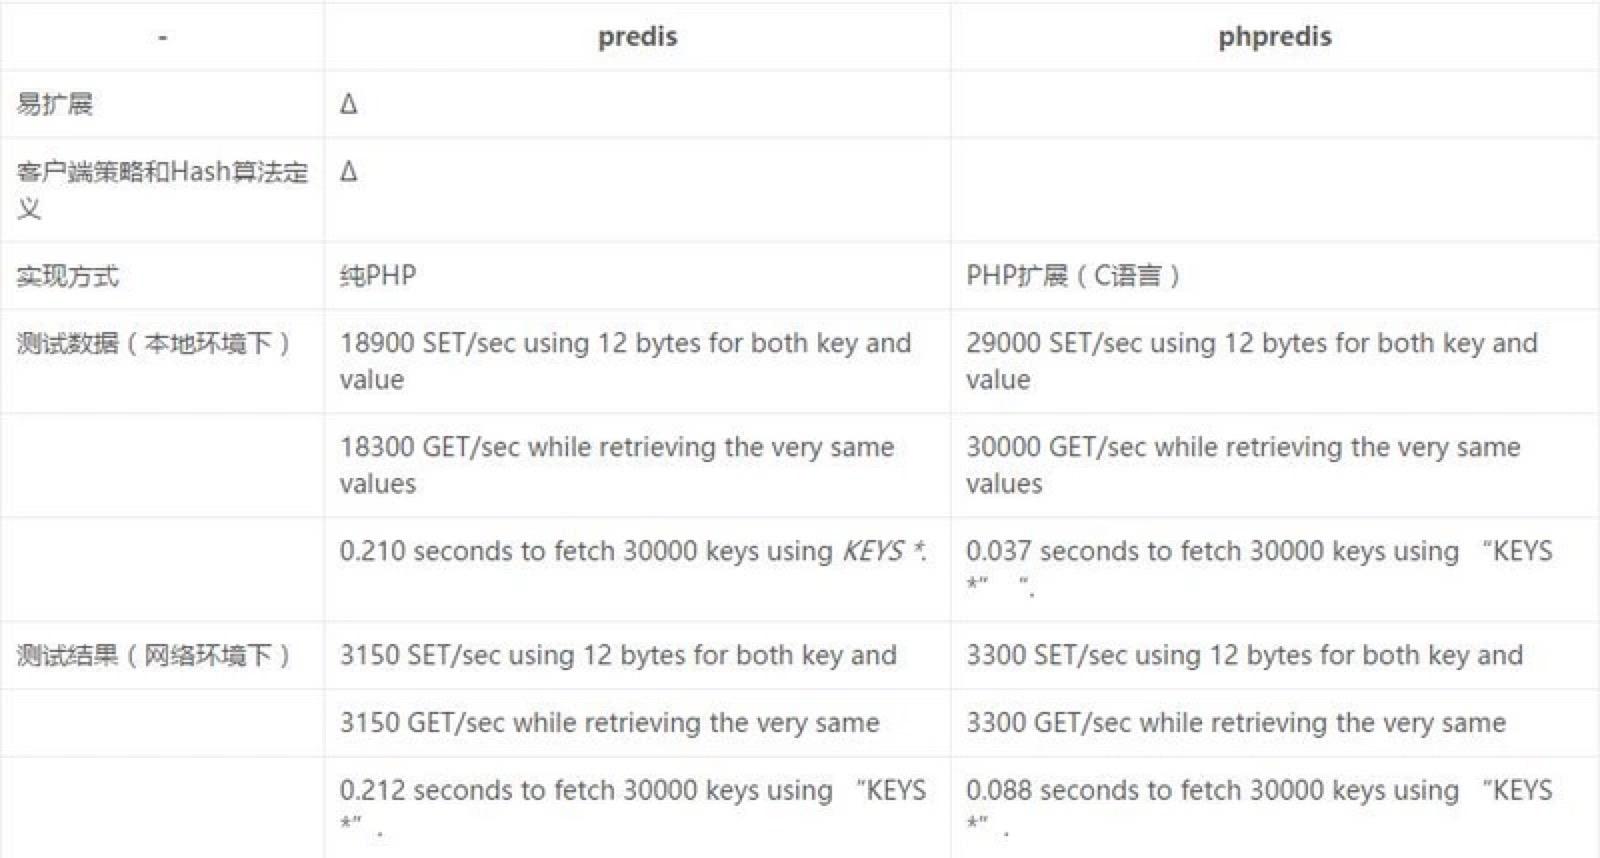 PHP中Redis驱动库Predis和phpRedis的区别